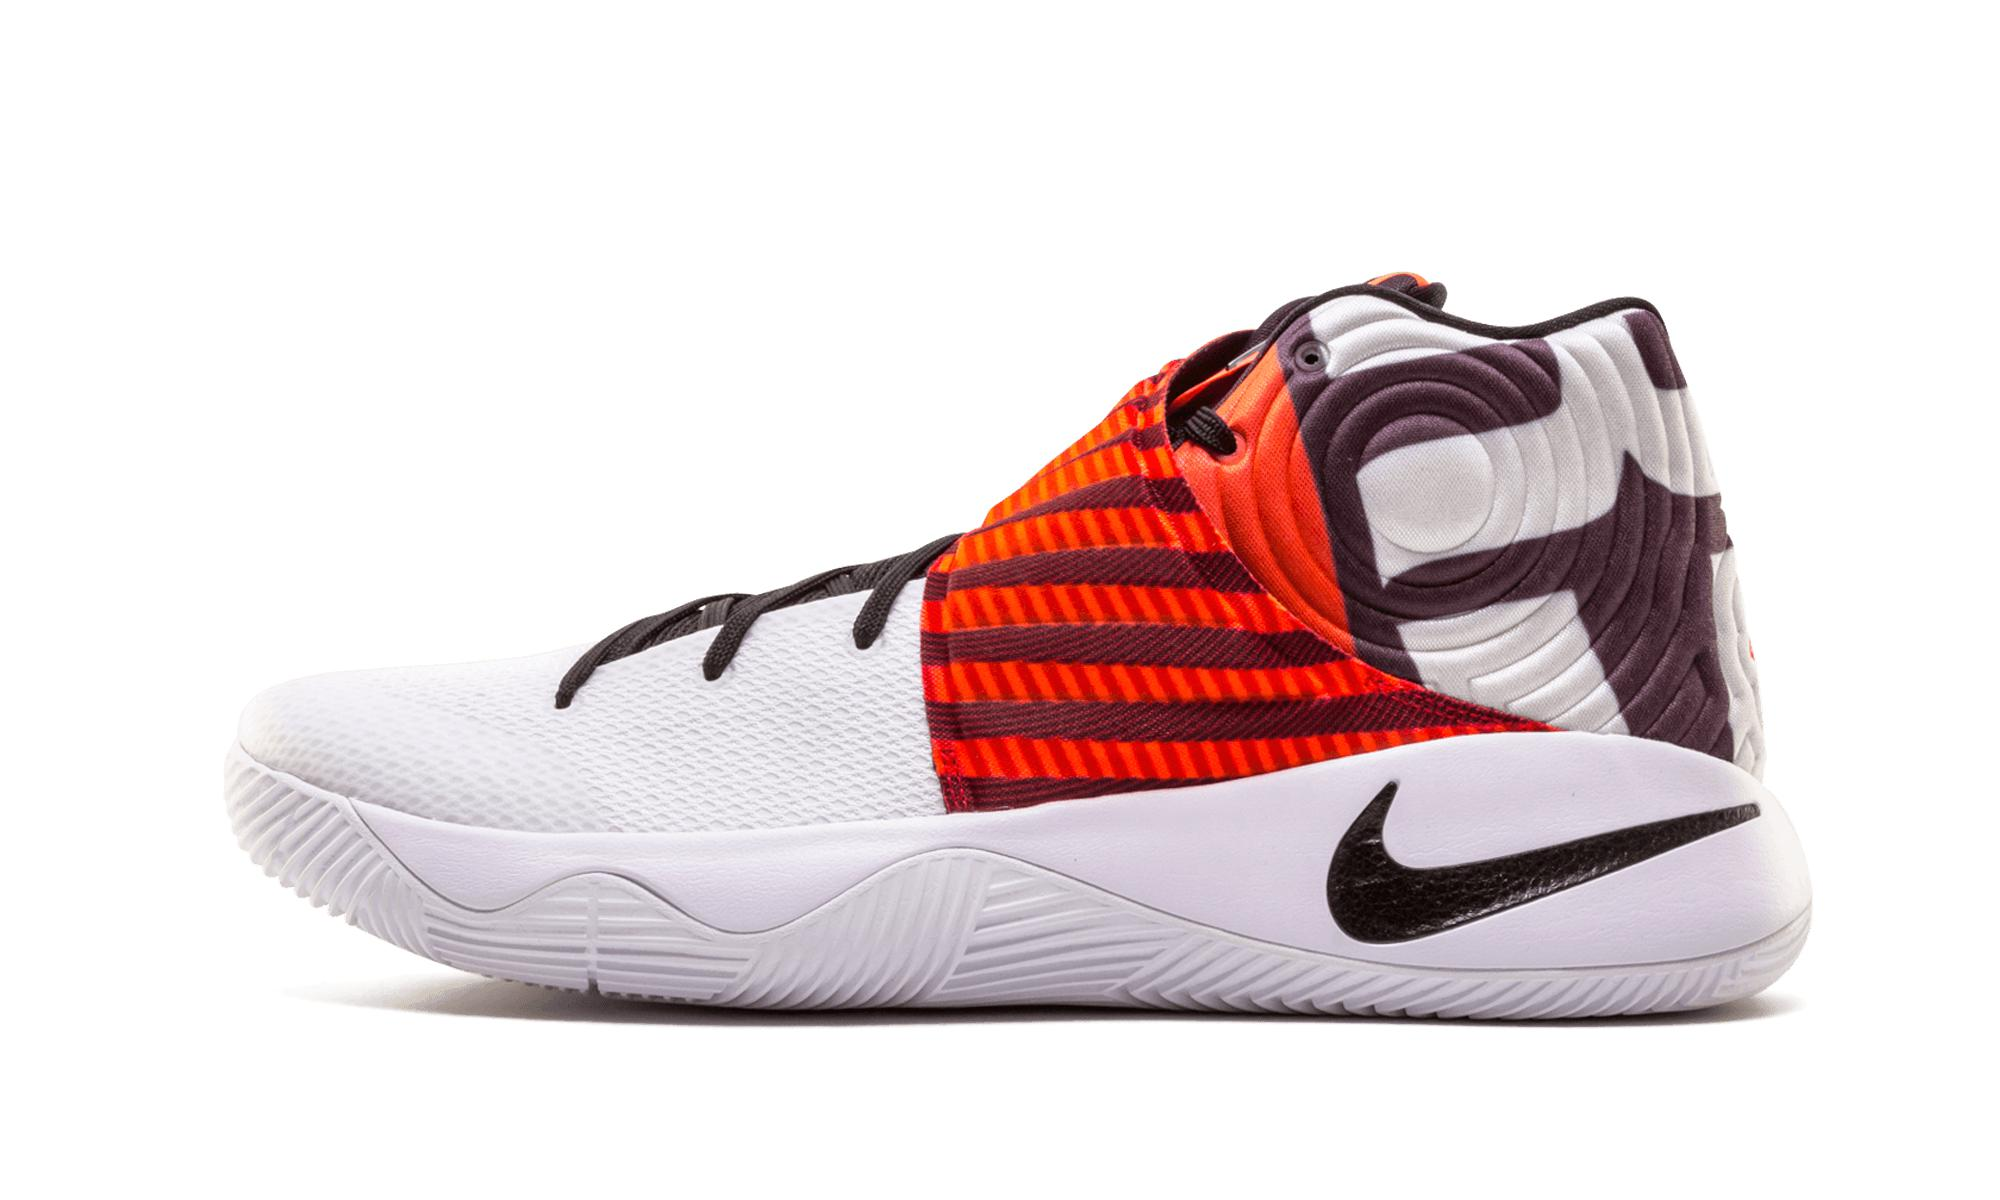 0899f48faa27 Lyst - Nike Kyrie 2 Lmtd for Men